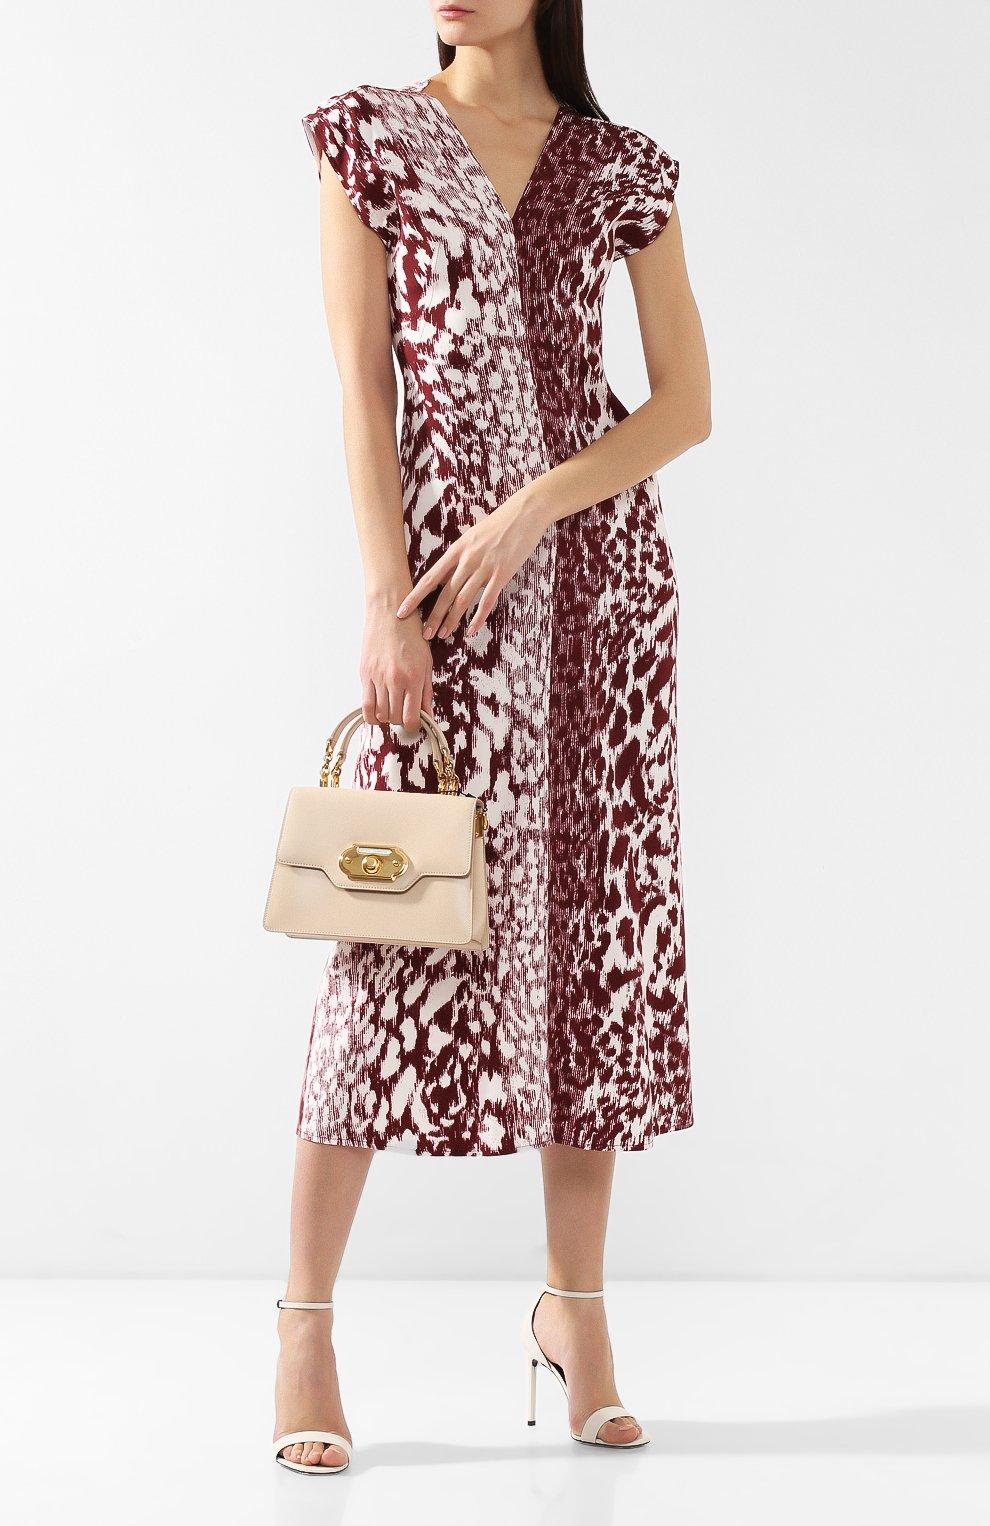 Сумка Welcome Dolce & Gabbana  светло-бежевая цвета | Фото №2